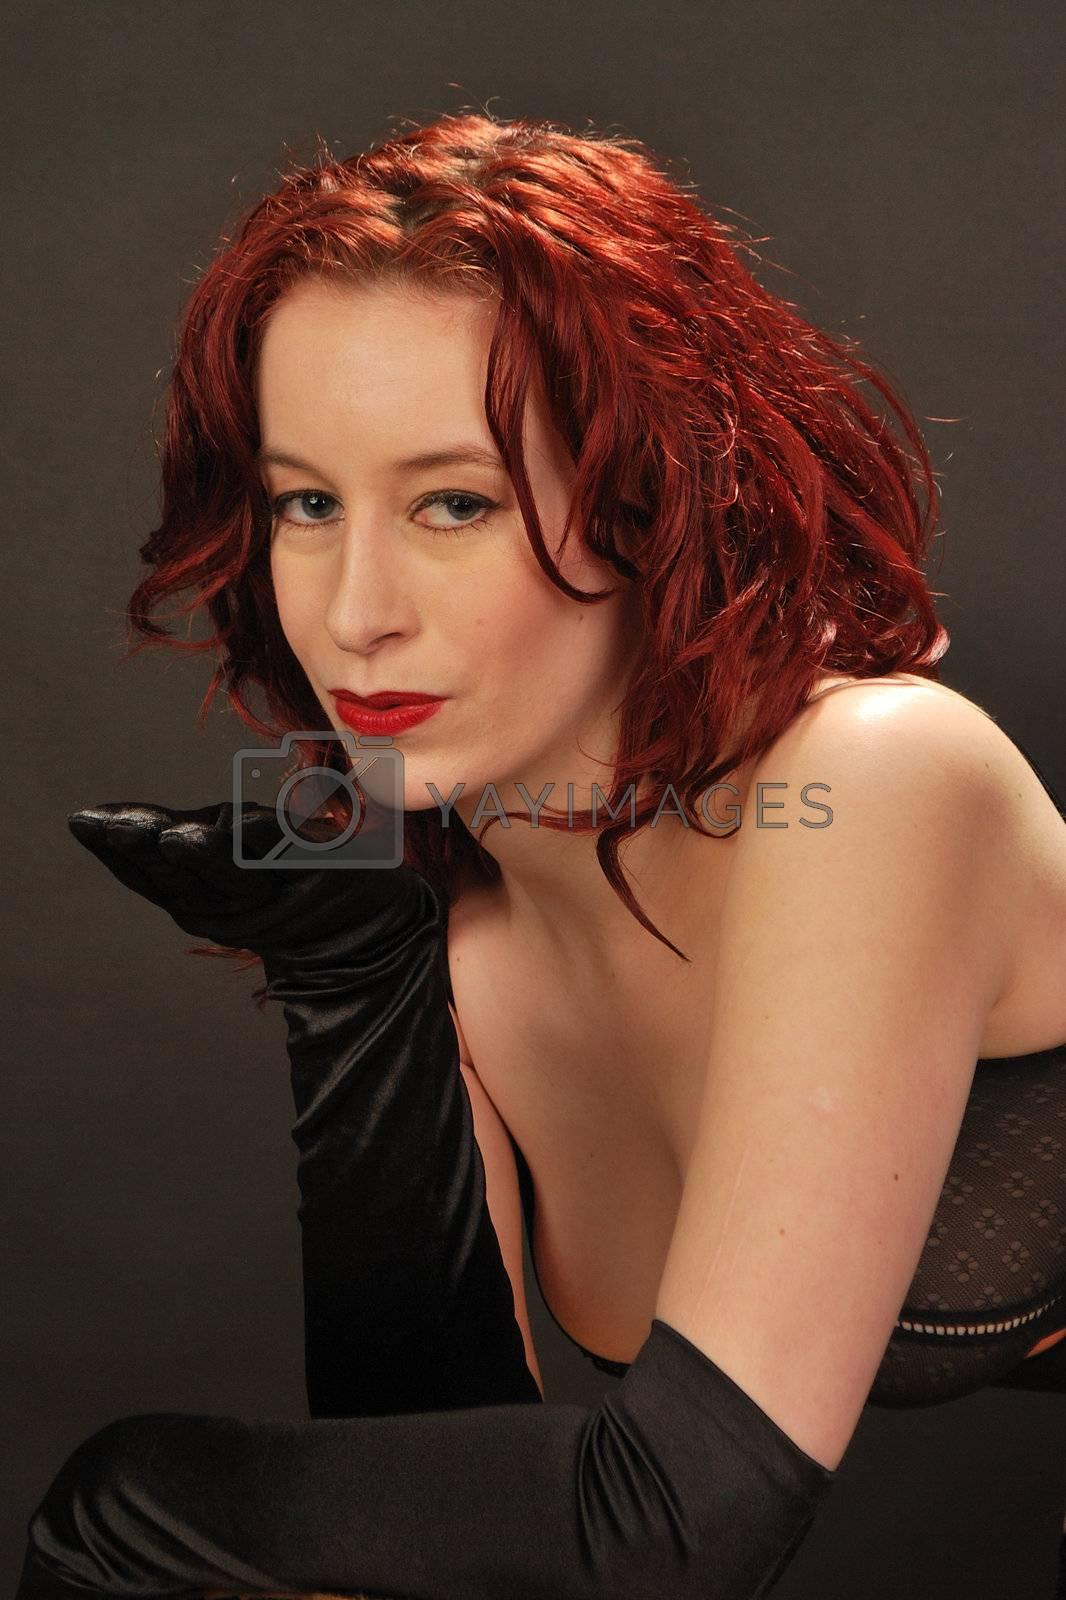 Sexy redhead blowing Kiss